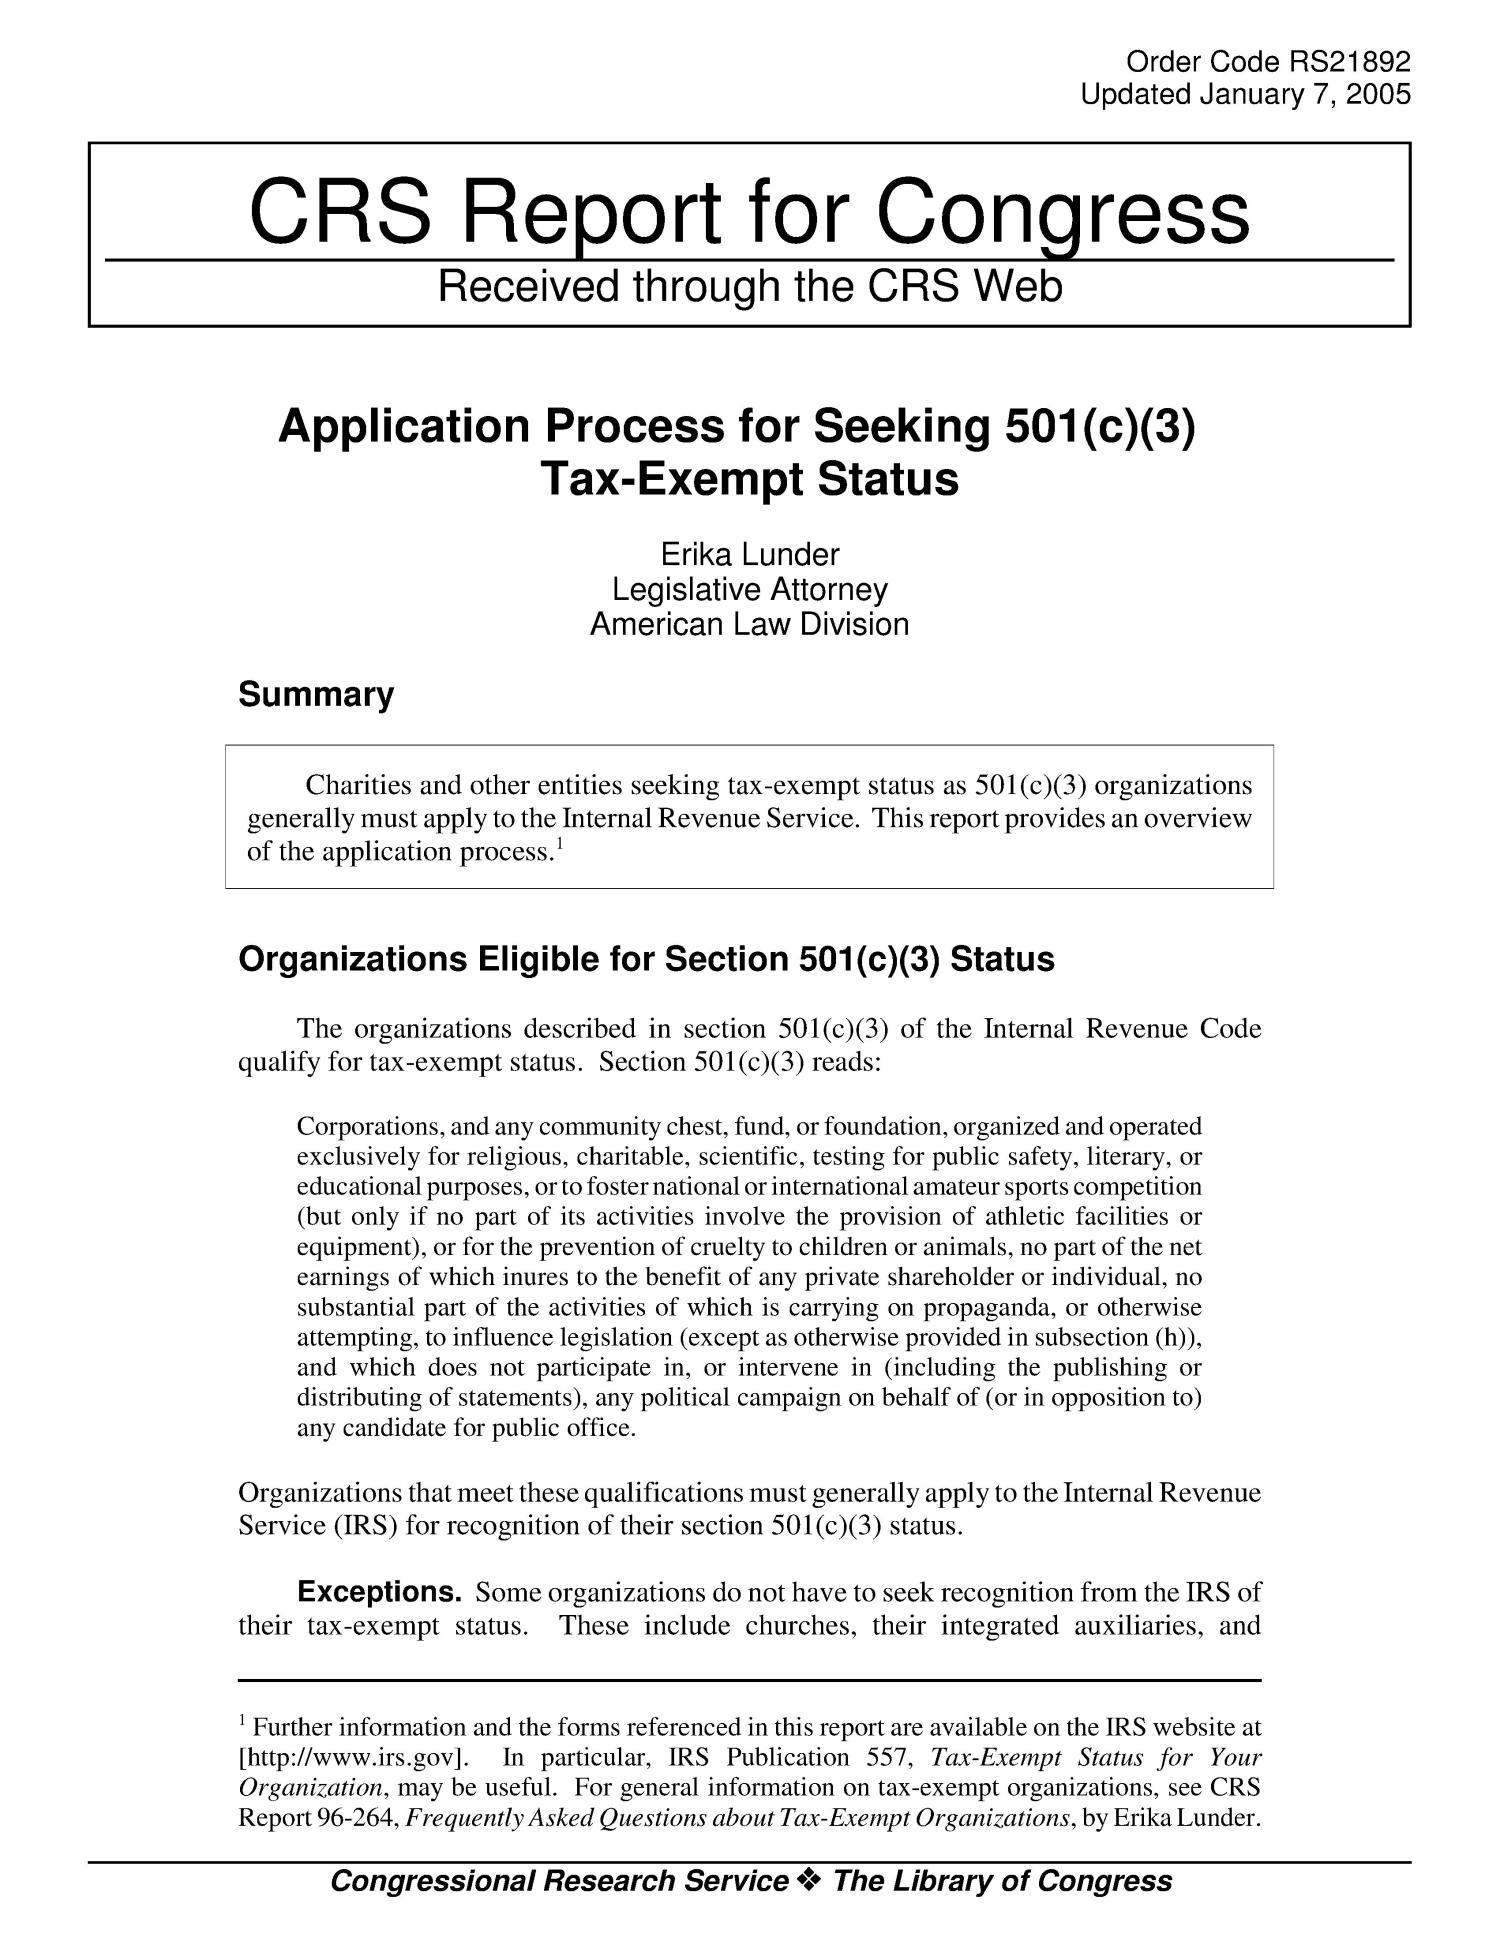 Application Process for Seeking 501(c)(3) Tax-Exempt Status ...